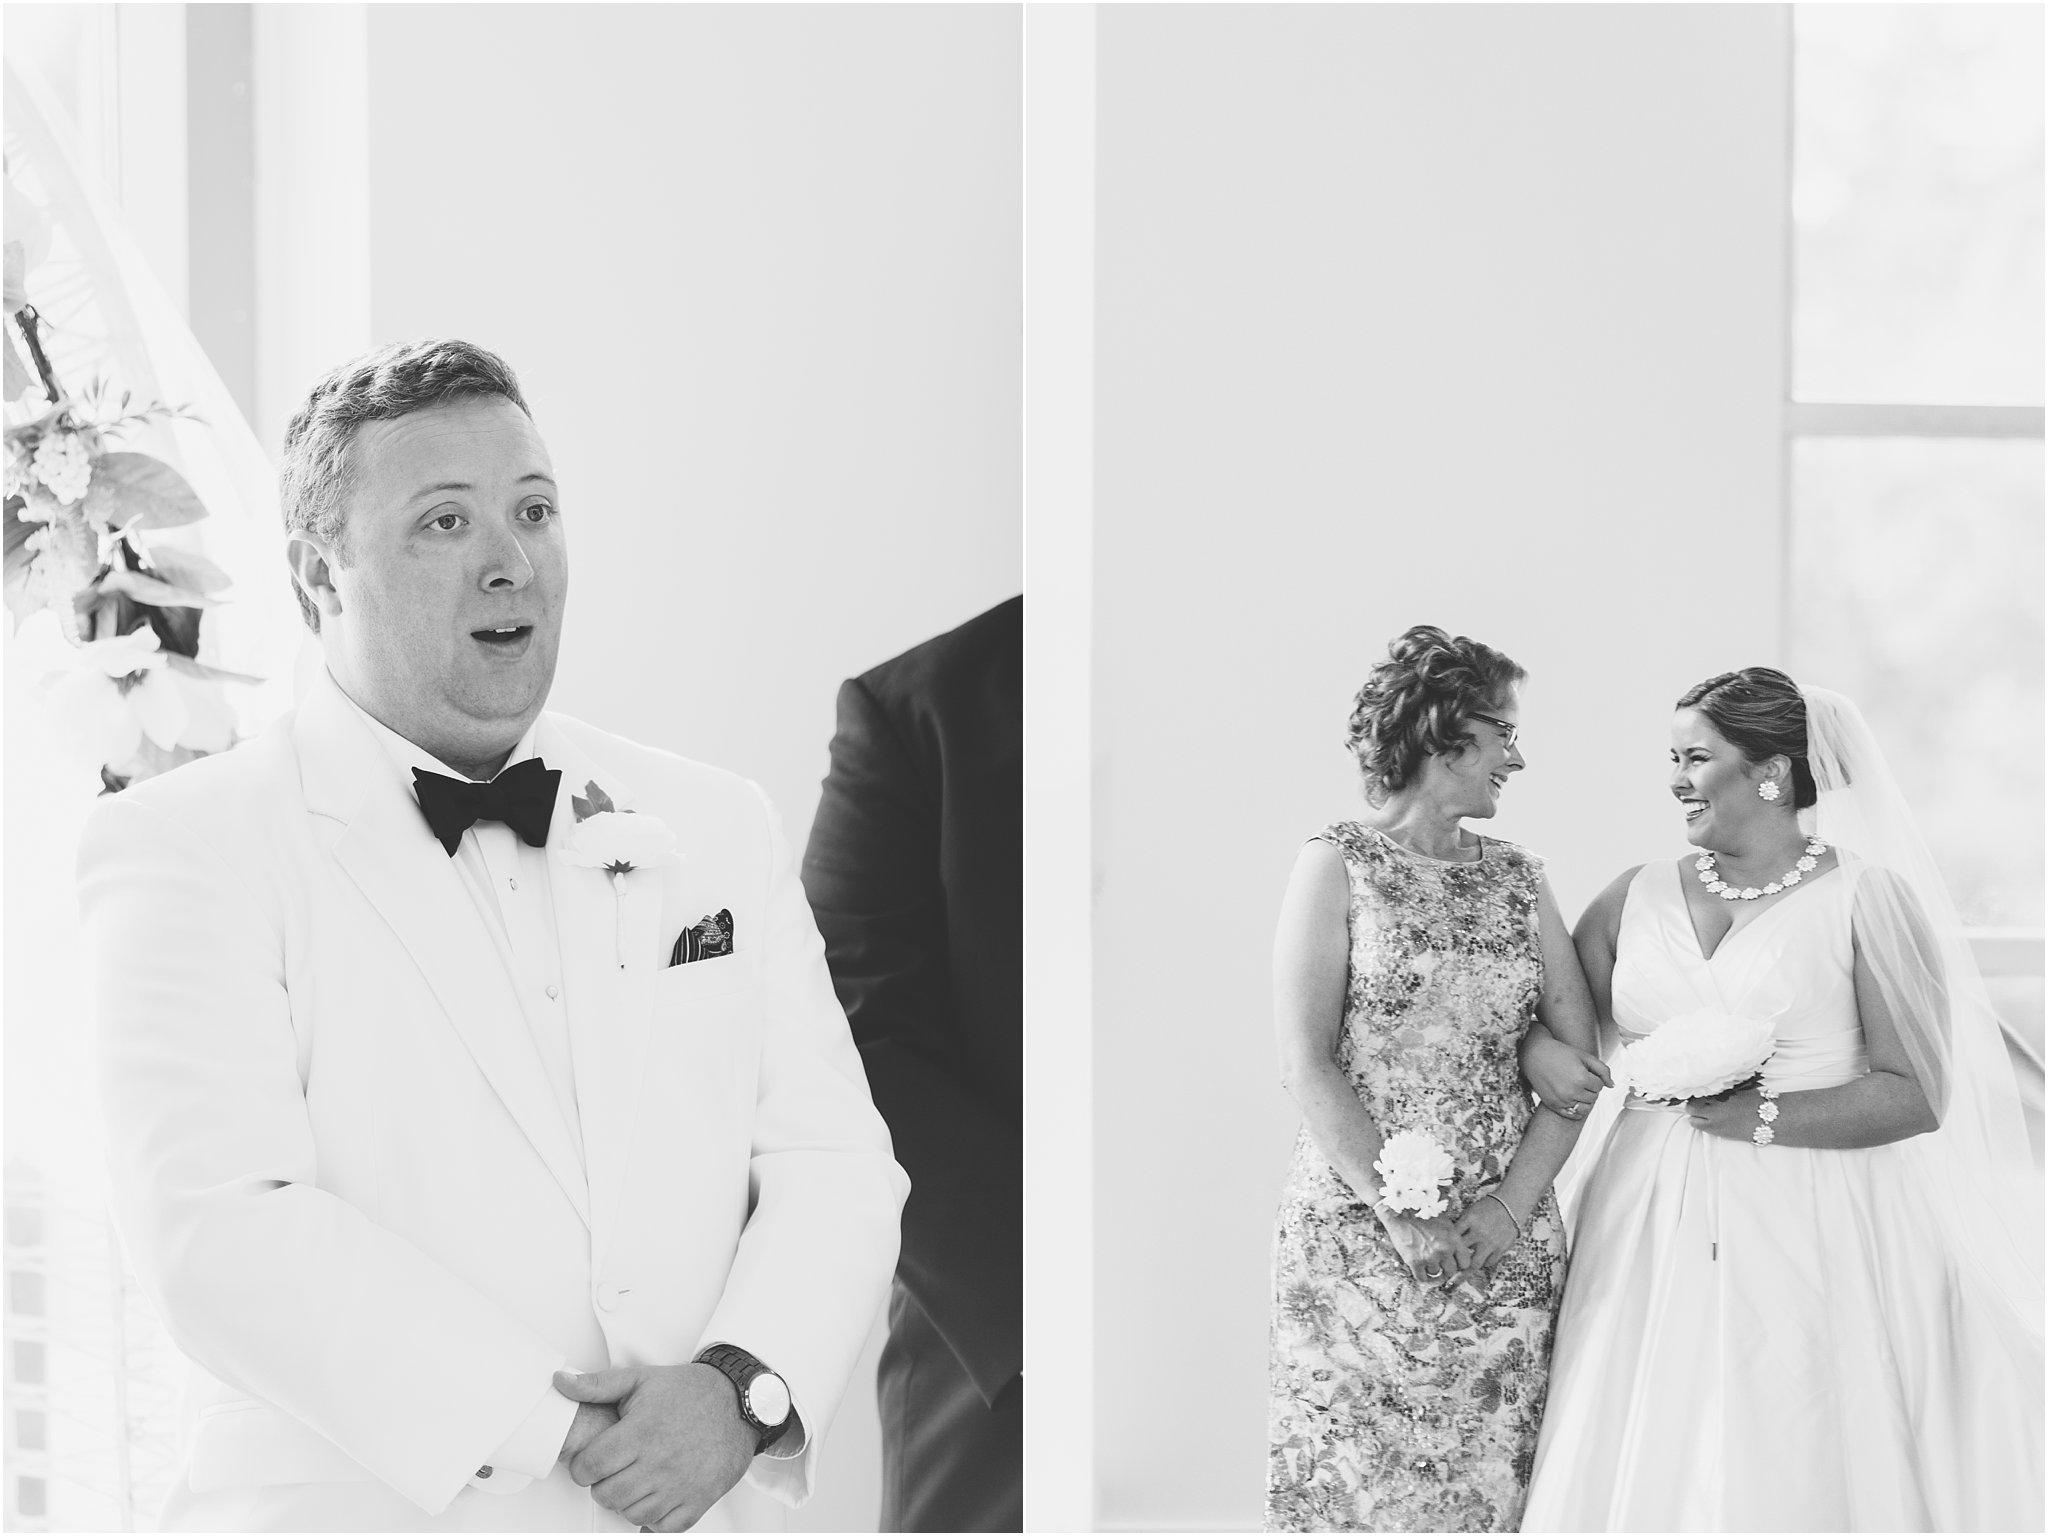 va_jessica_ryan_photography_virginia_wedding_norfolk_harrison_opera_house_norfolk_arts_district_portraits_3781